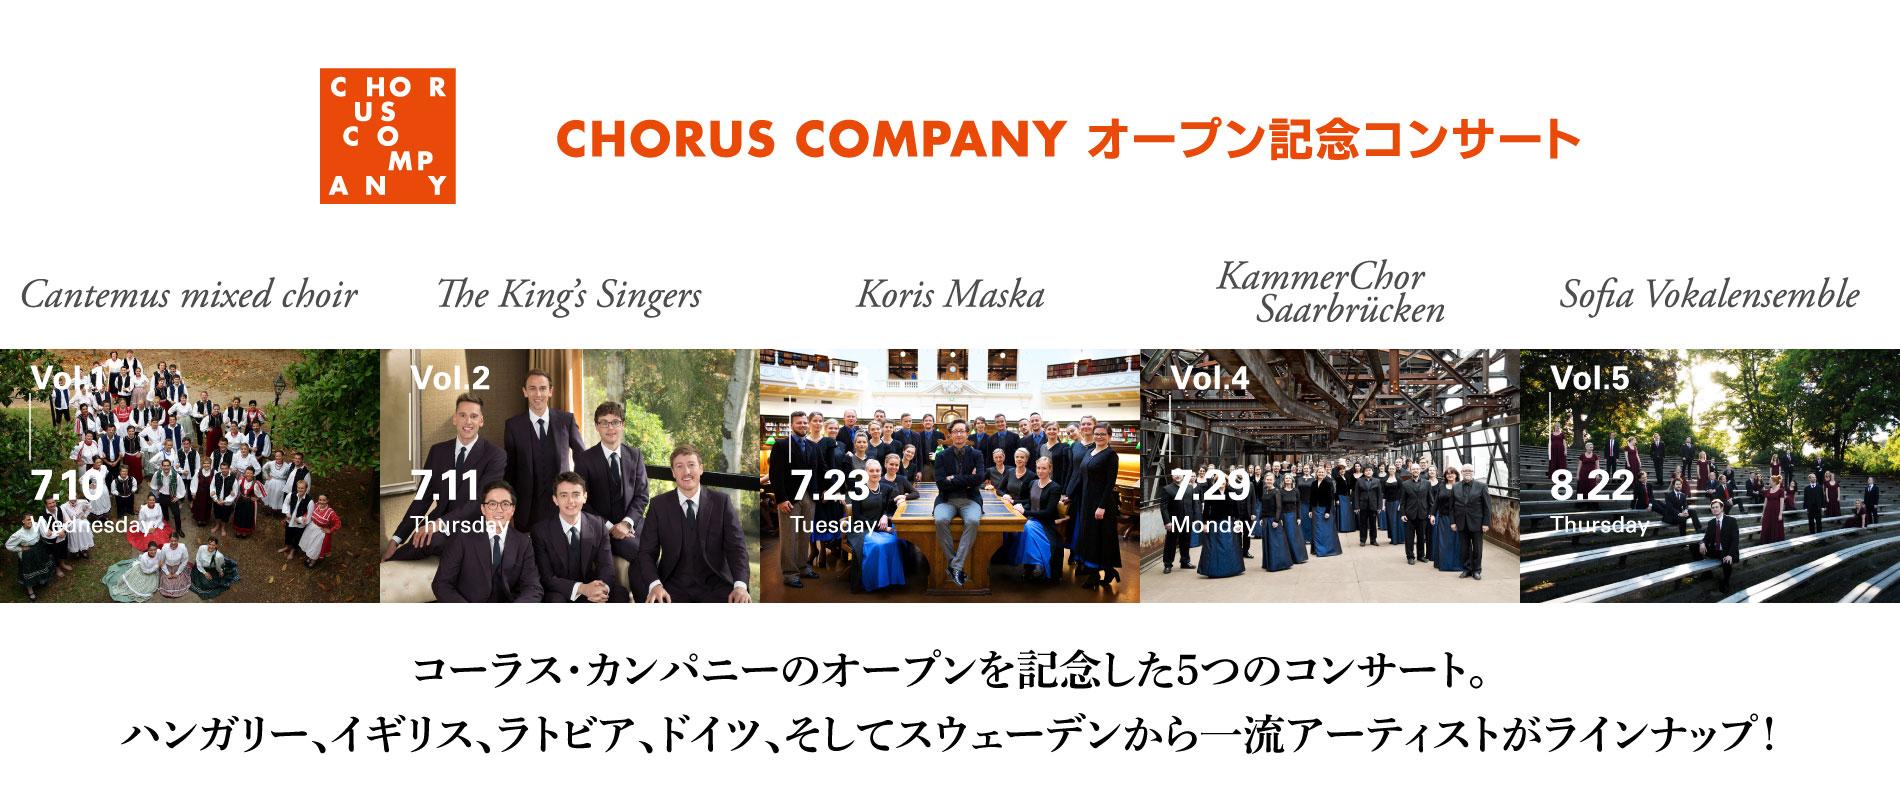 CHORUS COMPANY オープン記念コンサート